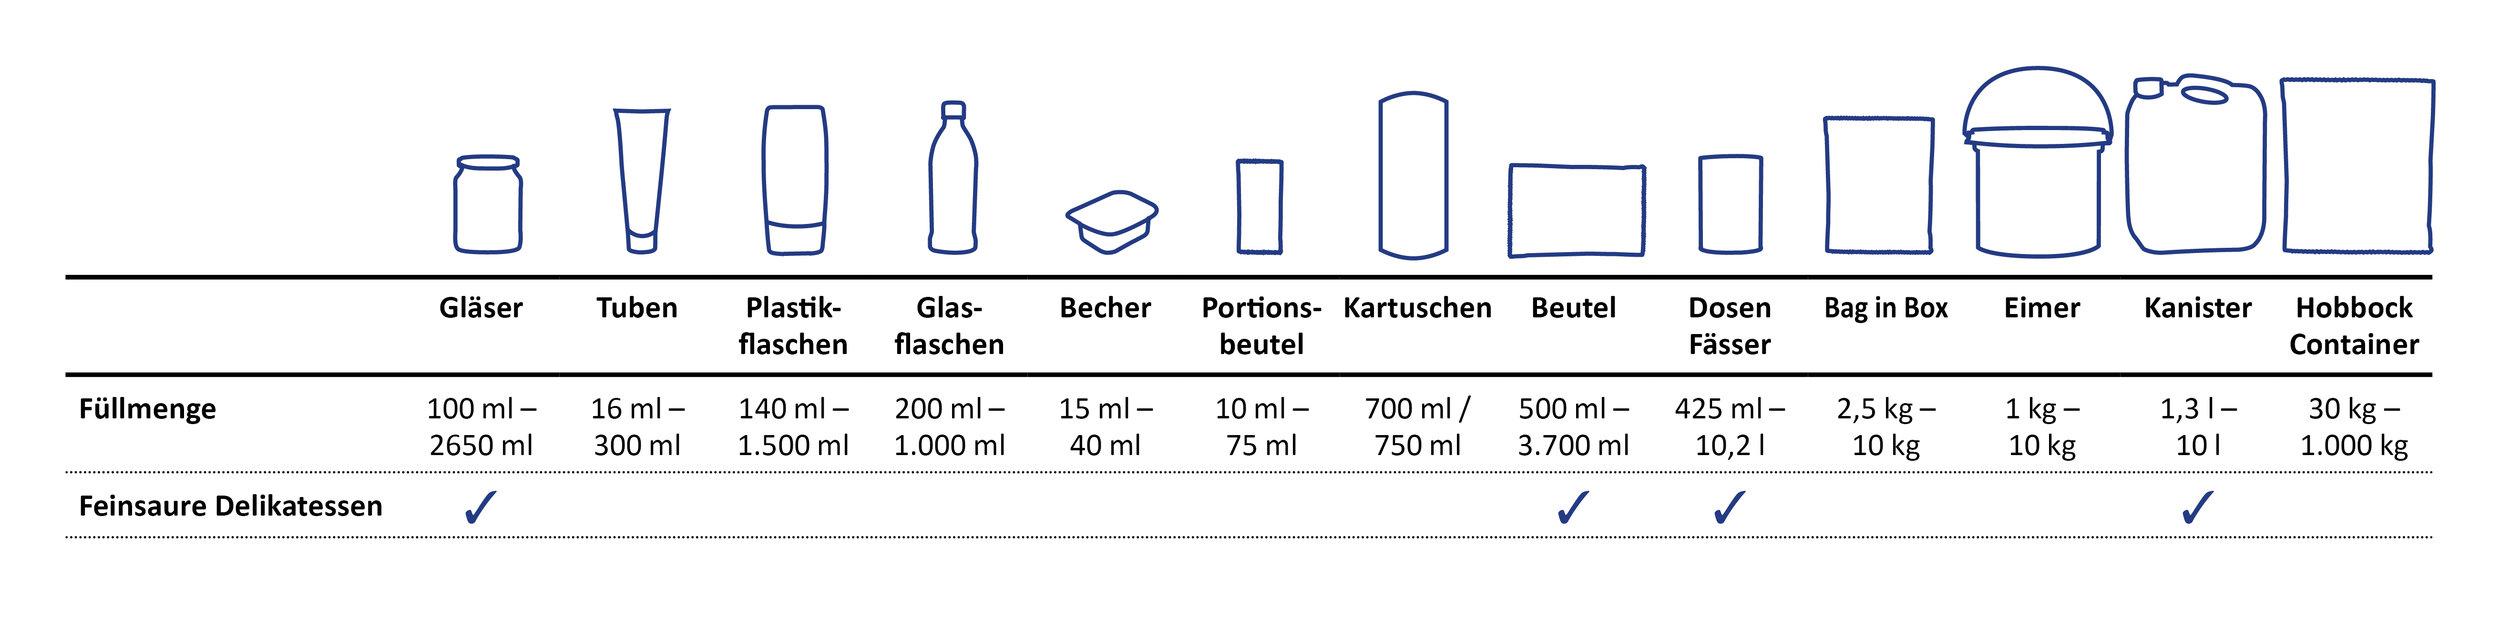 verpackungsuebersicht -sueko-feinsaure-delikatessen.jpg